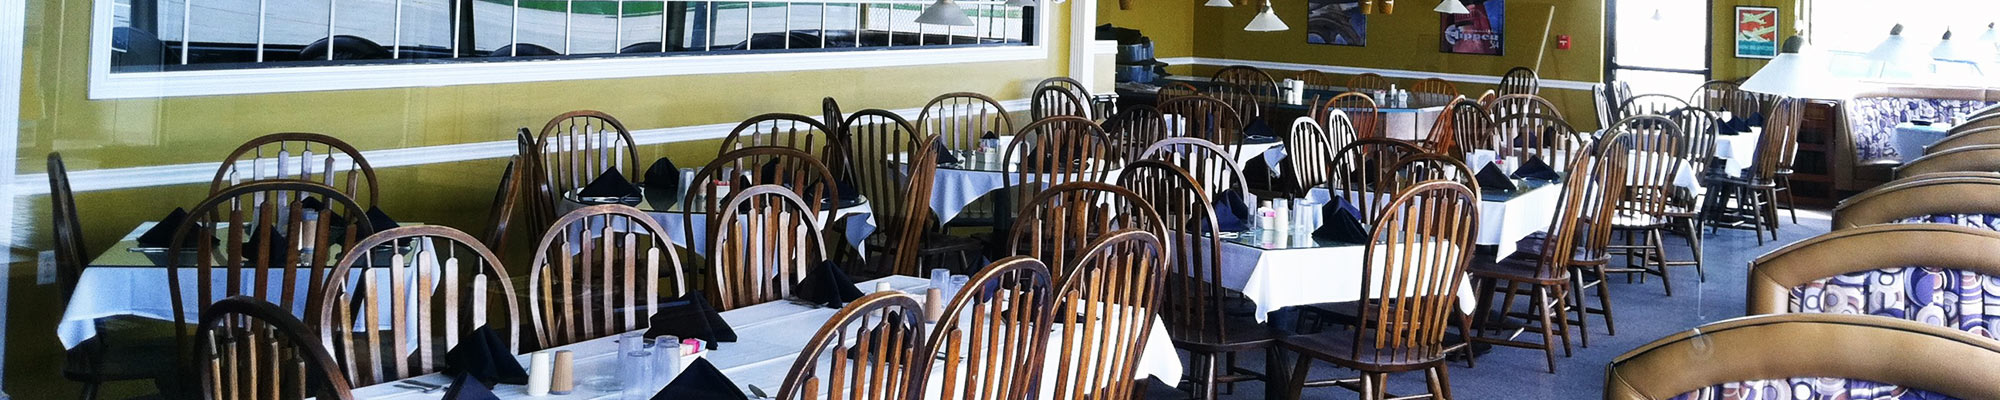 Hangar 5 restaurant tables